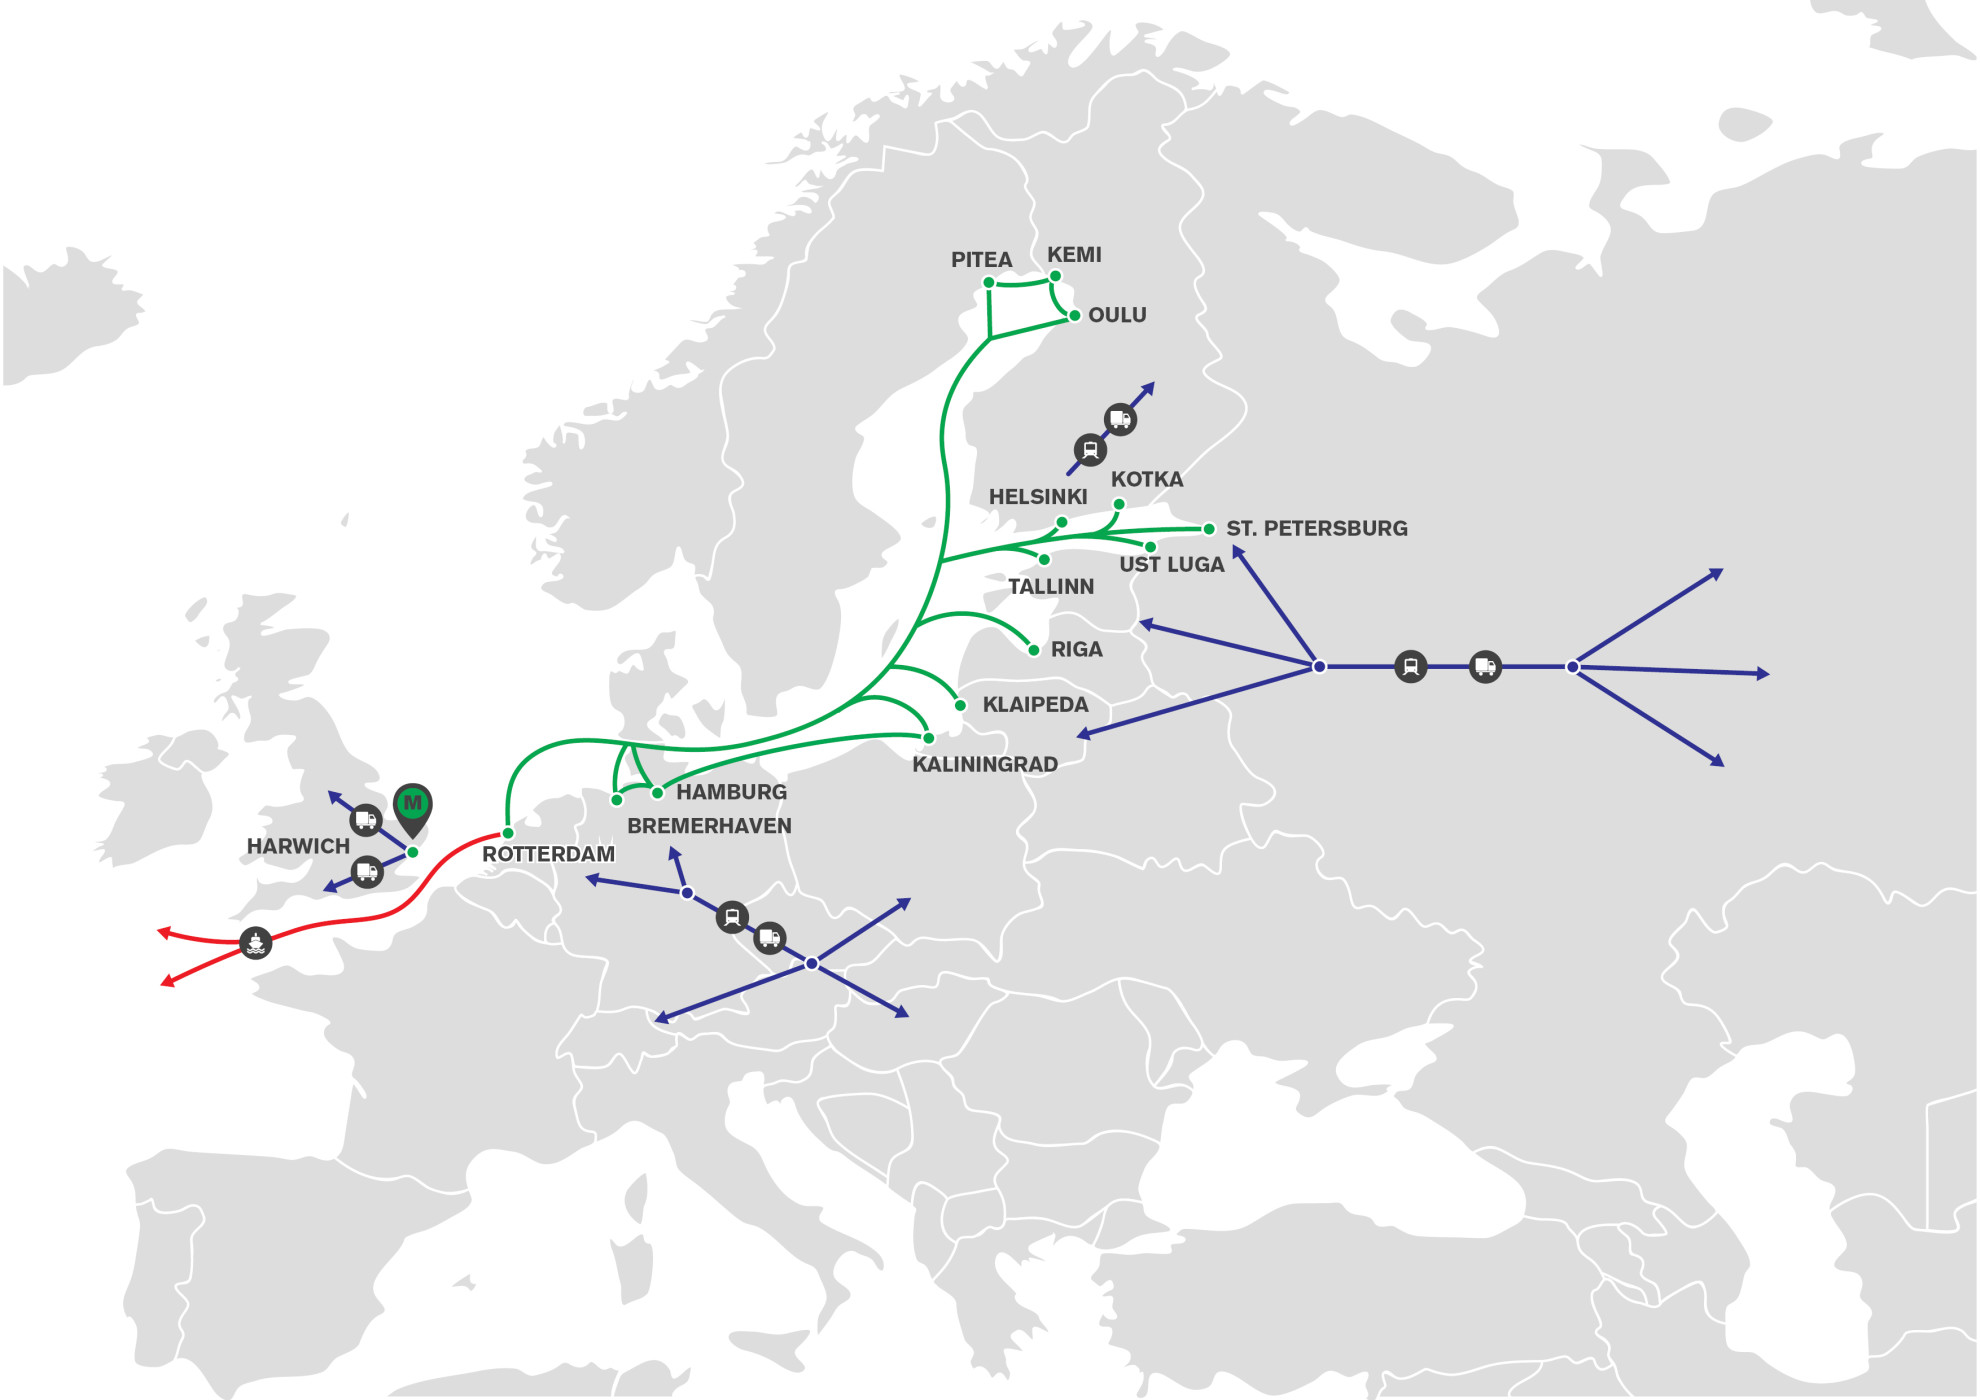 mann lines multimodal limited provides a container feeder service between rotterdam bremerhaven hamburg kaliningrad riga tallinn ust luga